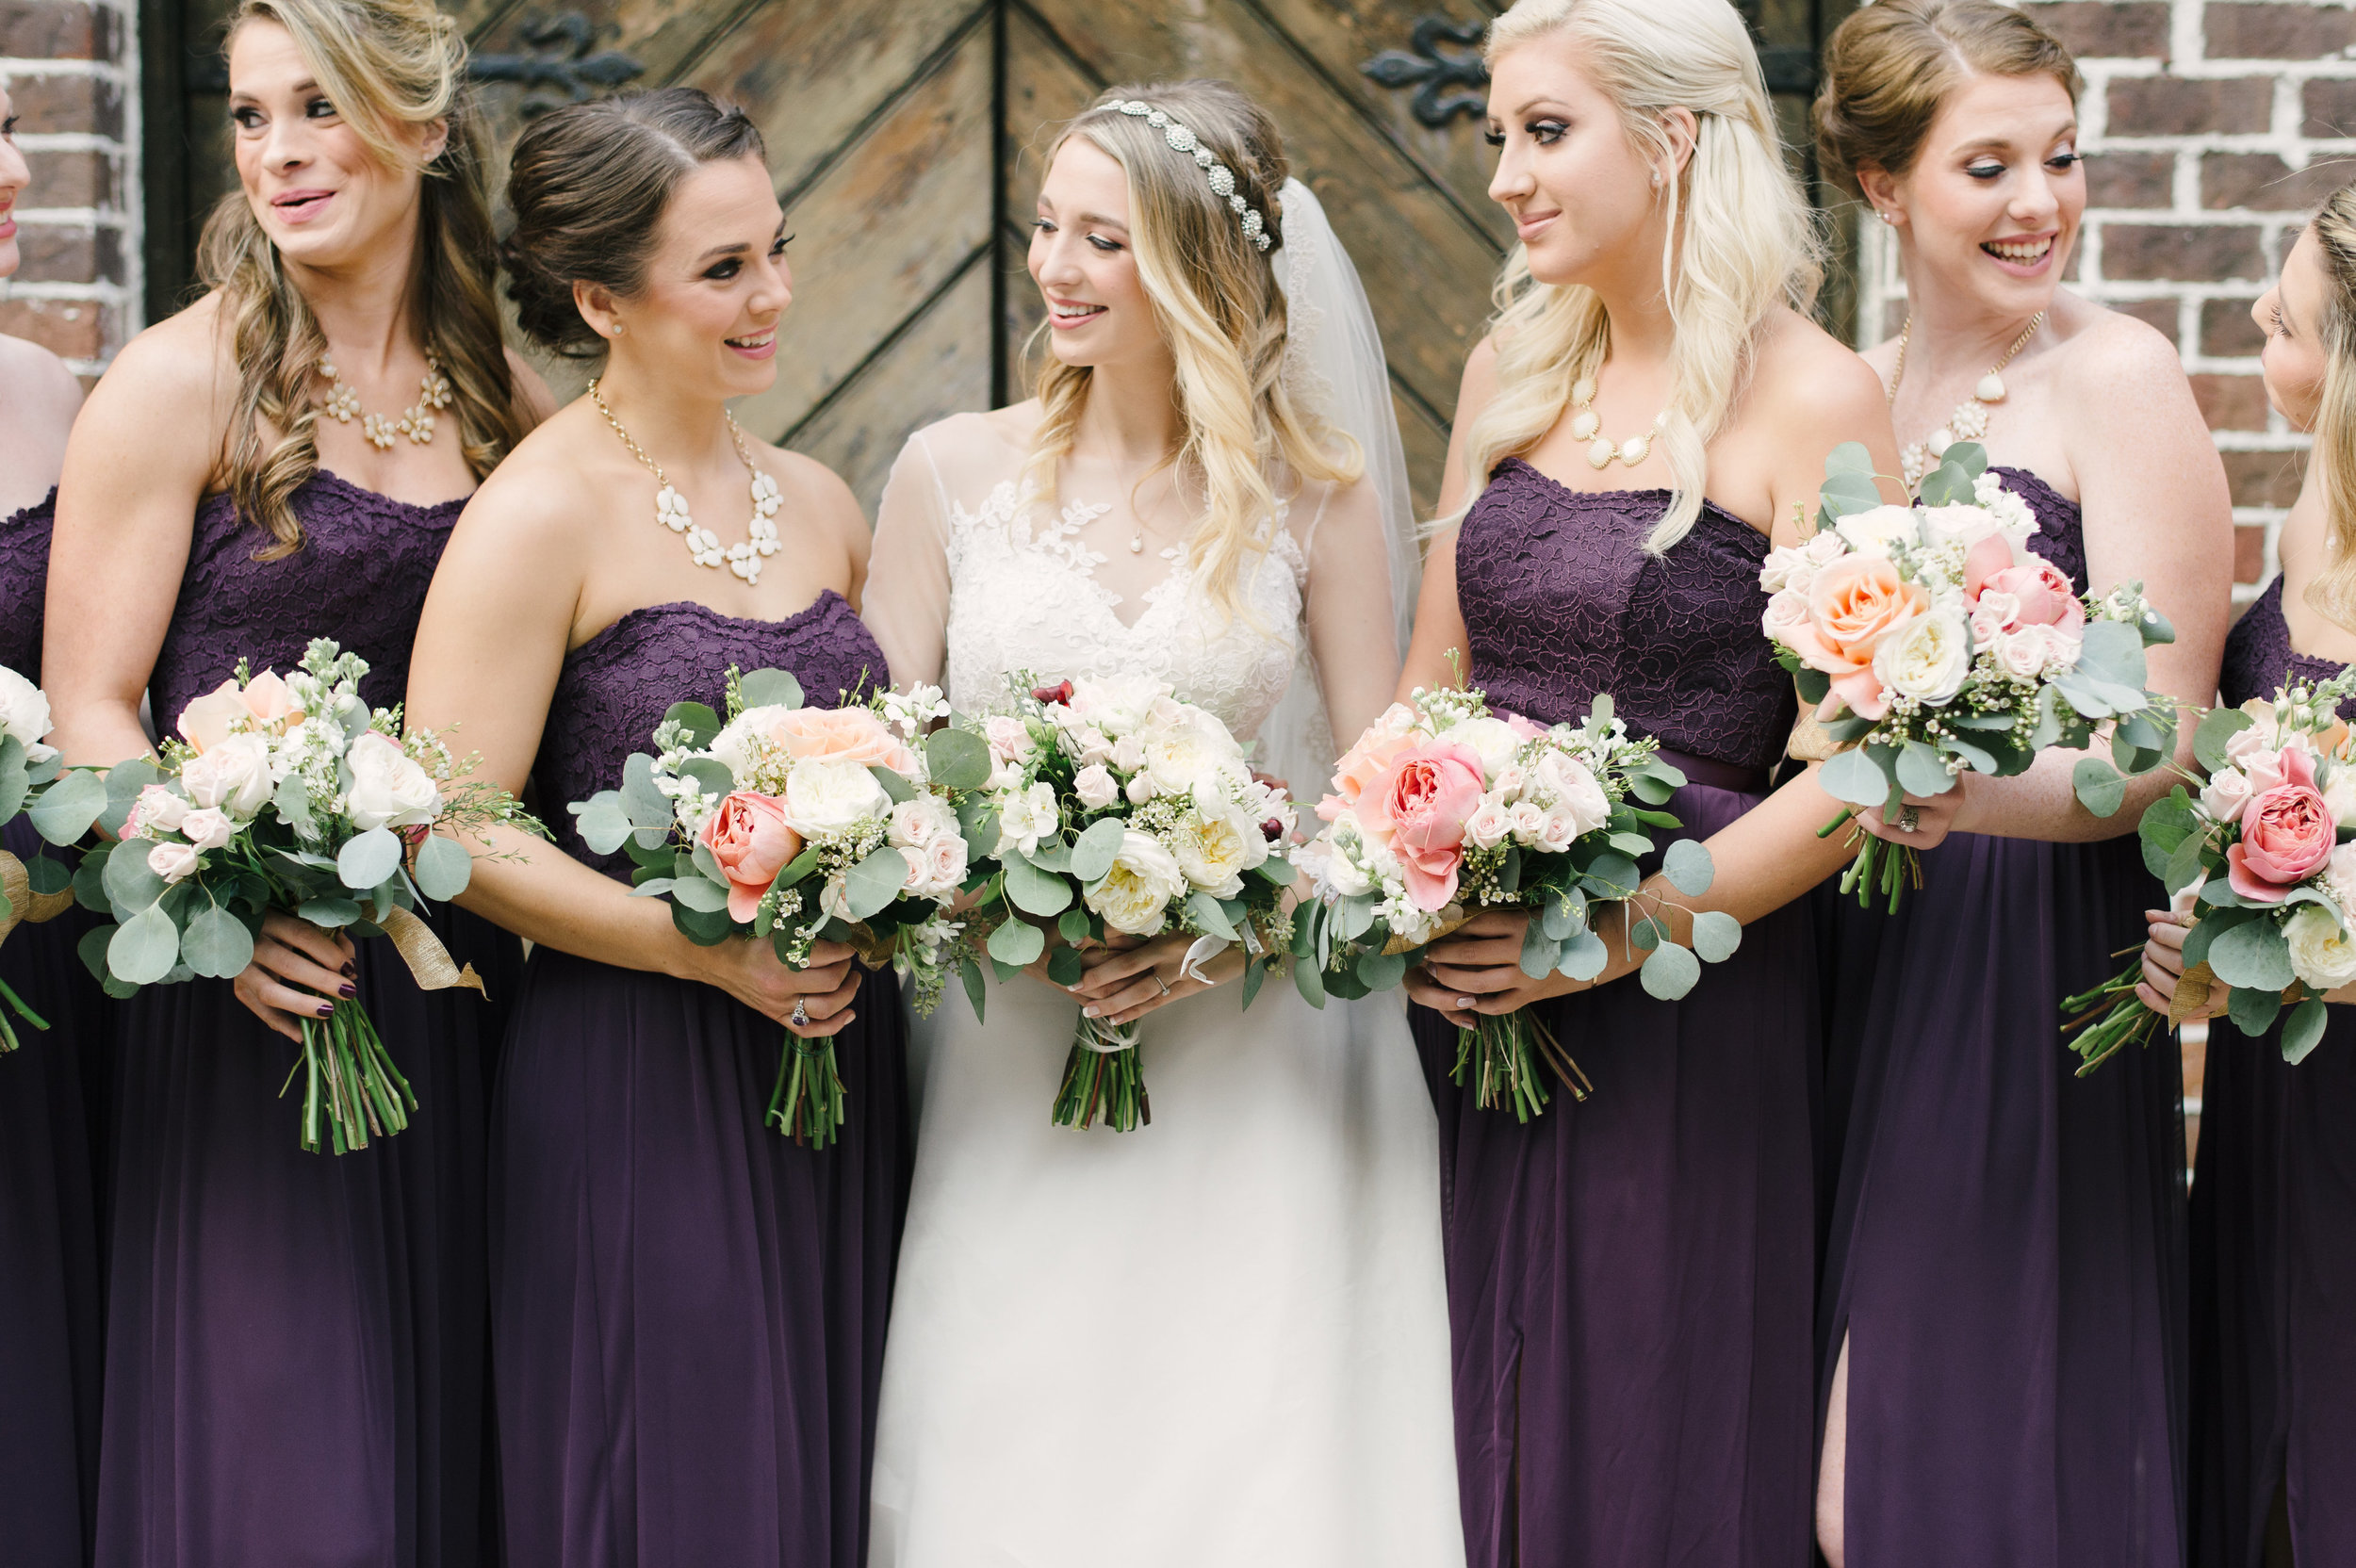 BridalParty-Molo-Wedding-Sarah-Street-Photography-112.jpg